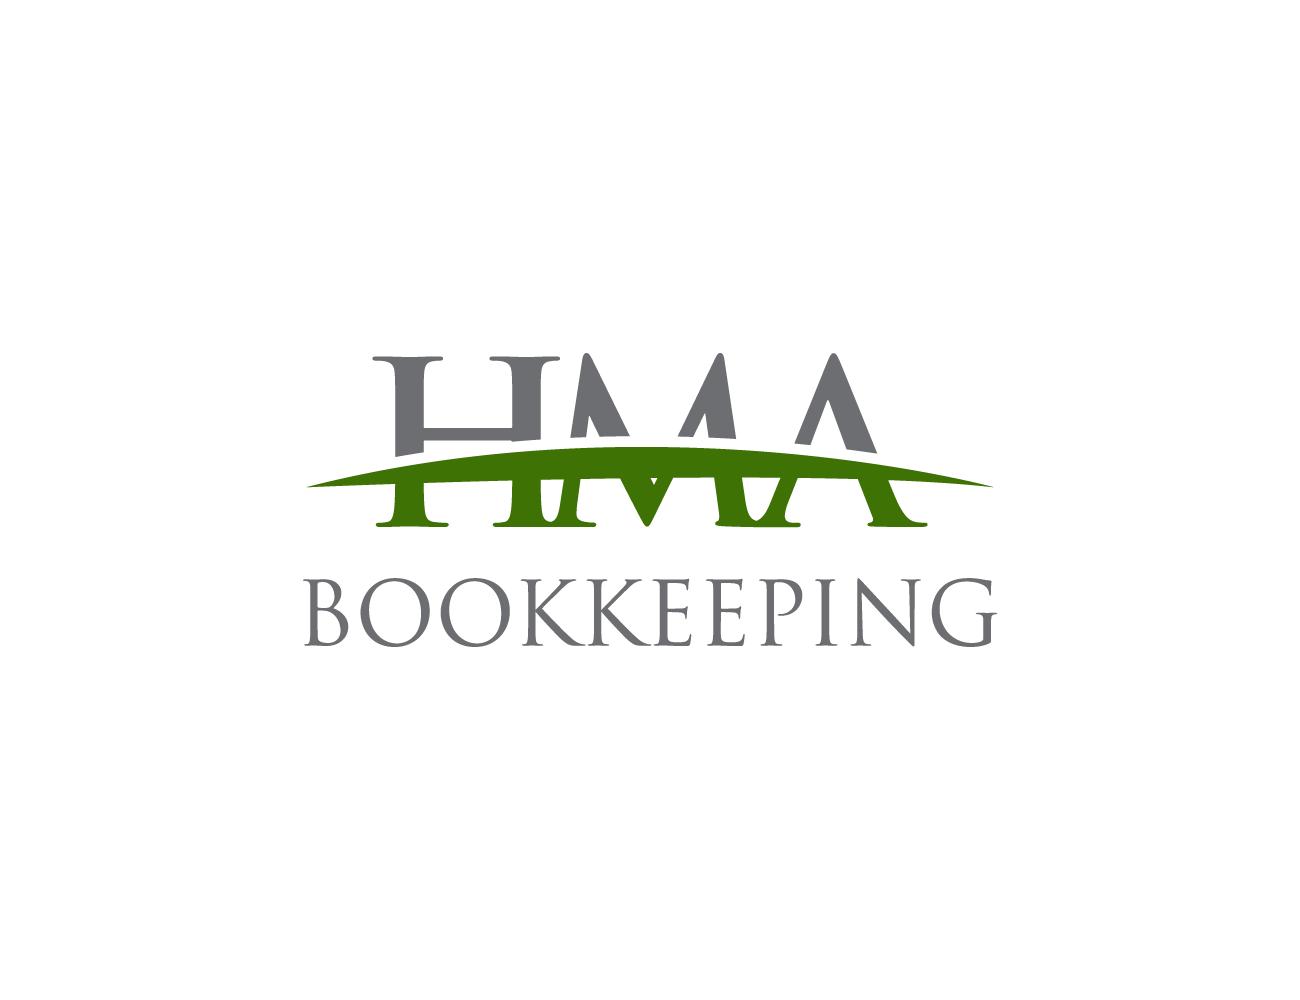 Business Logo Design for HMA Bookkeeping by En_drow